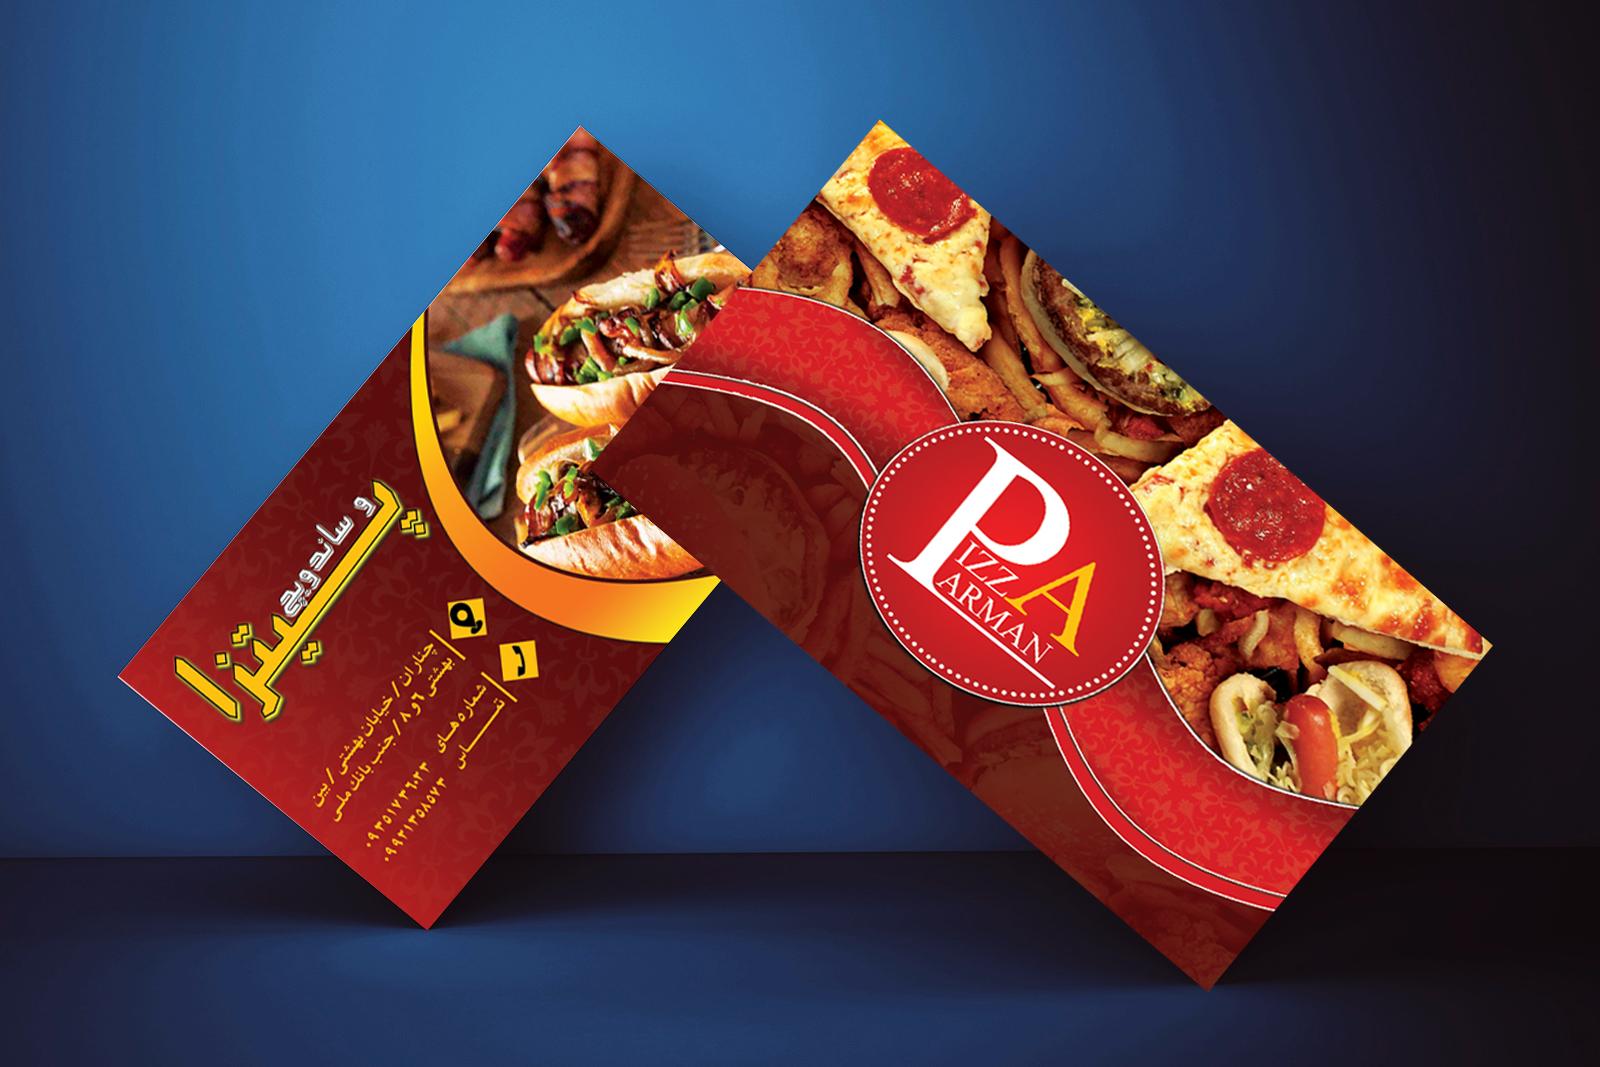 vizit 8.5 5.5 pizza - کارت ویزیت فست فود و پیتزا